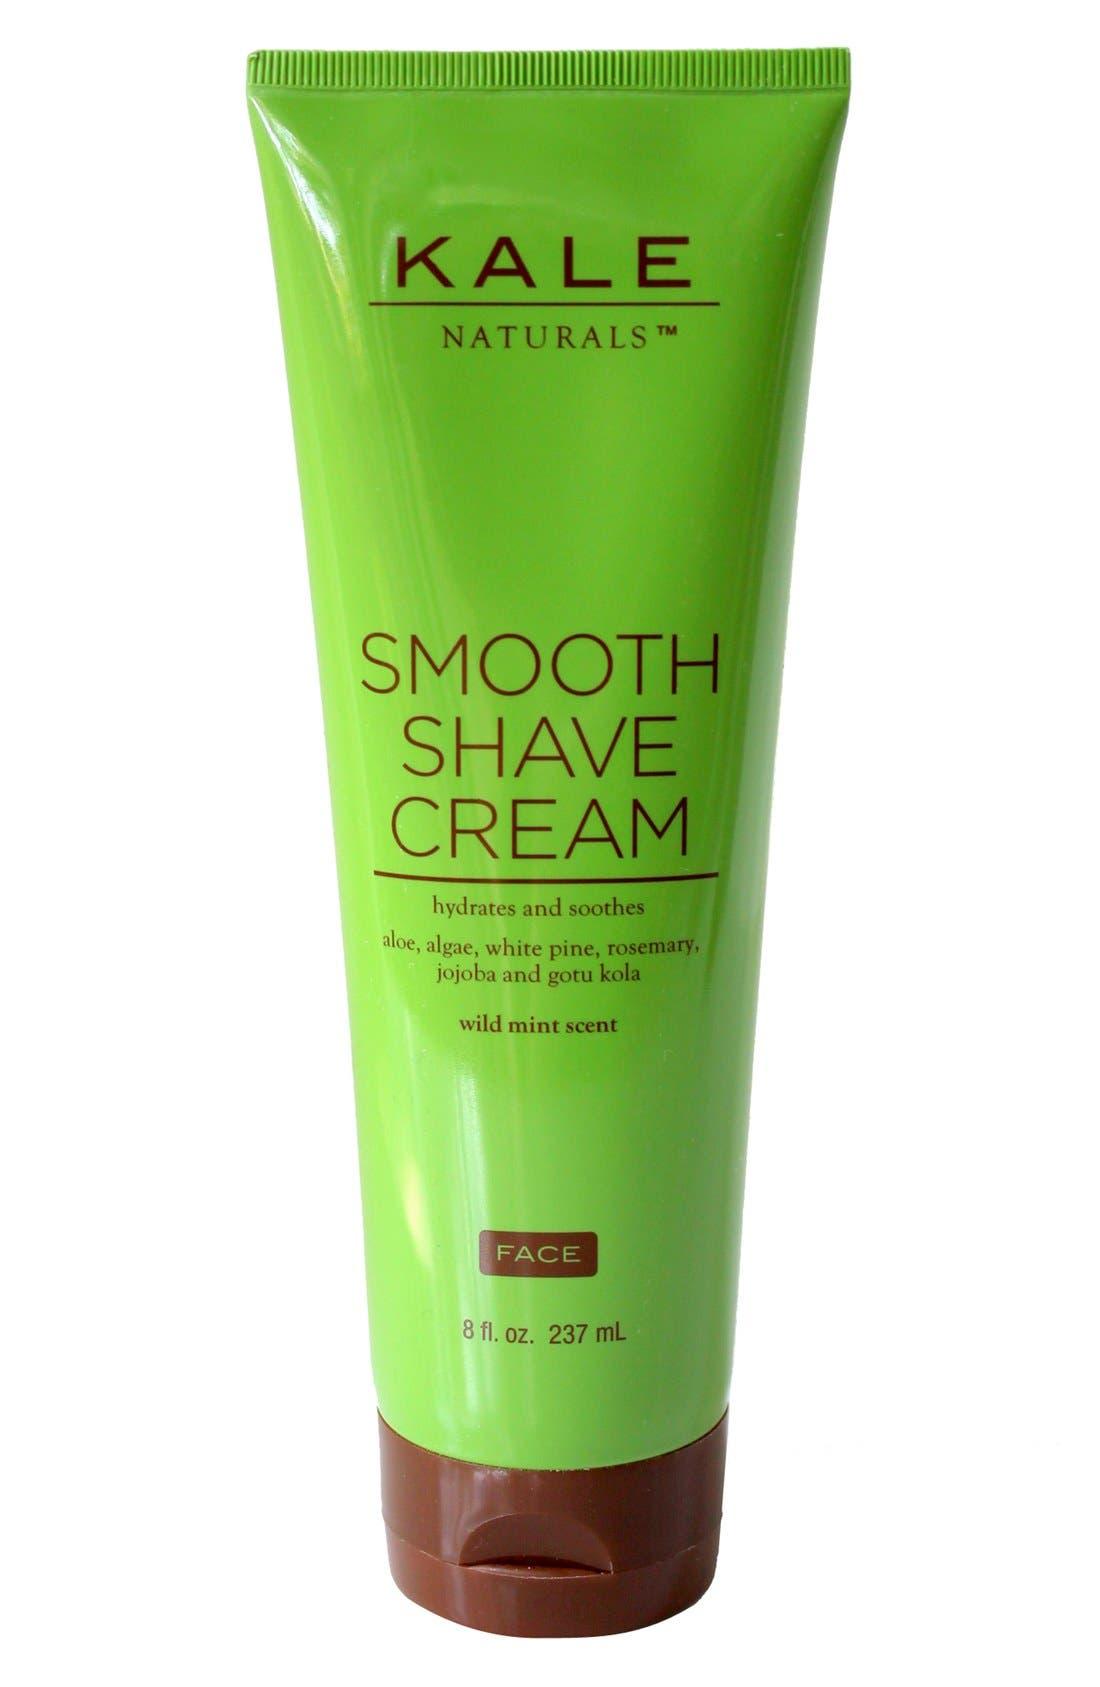 Kale Naturals® Smooth Shave Cream